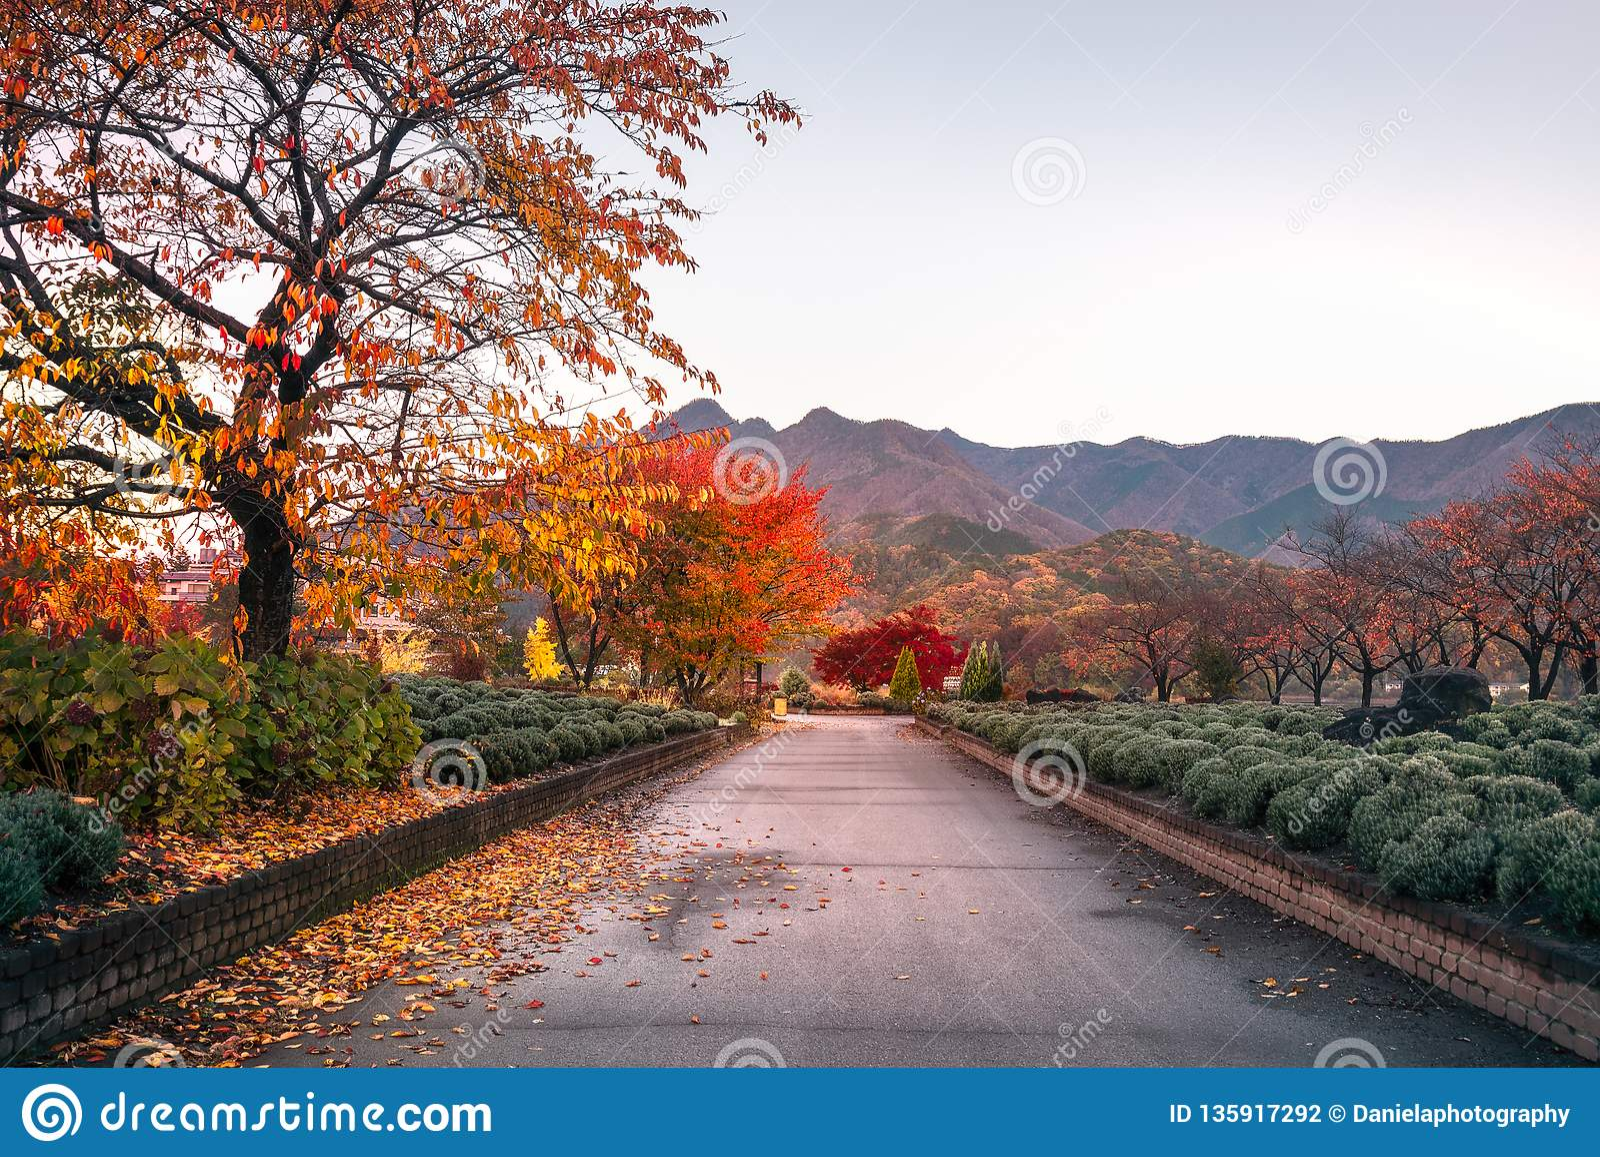 Spectacular morning after sunrise on an autumn path, Japan.